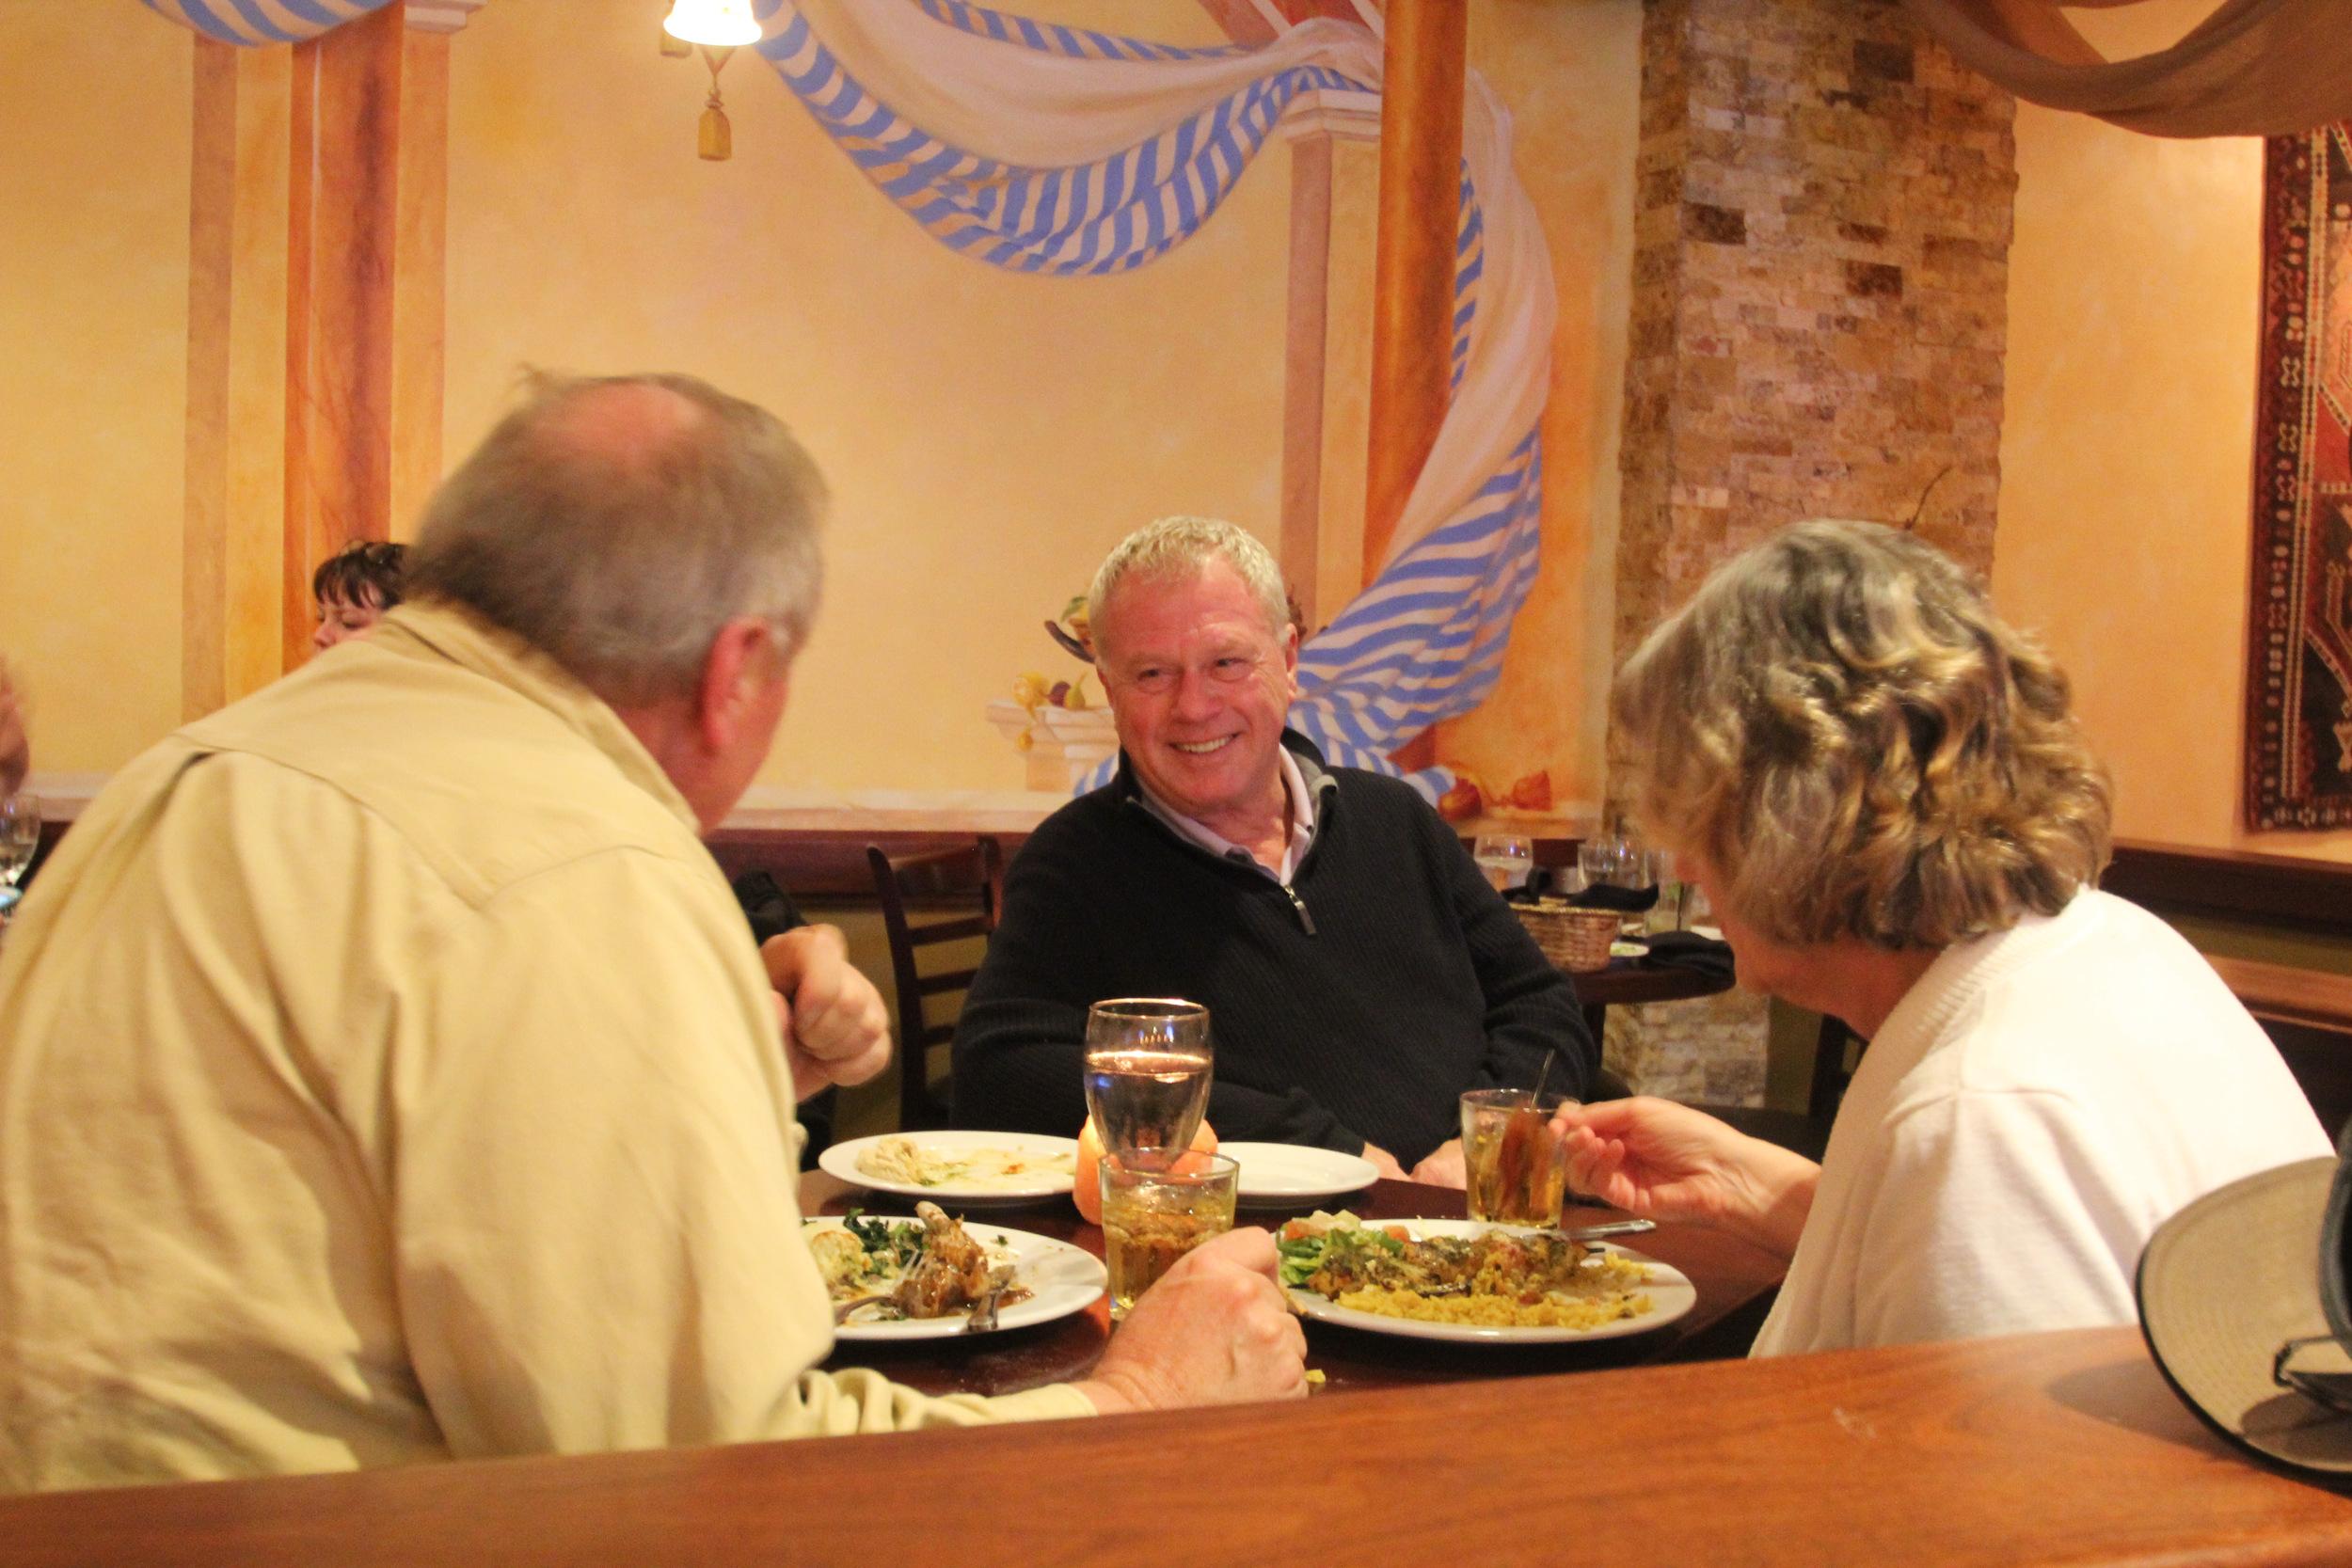 Our regulars enjoying their meal